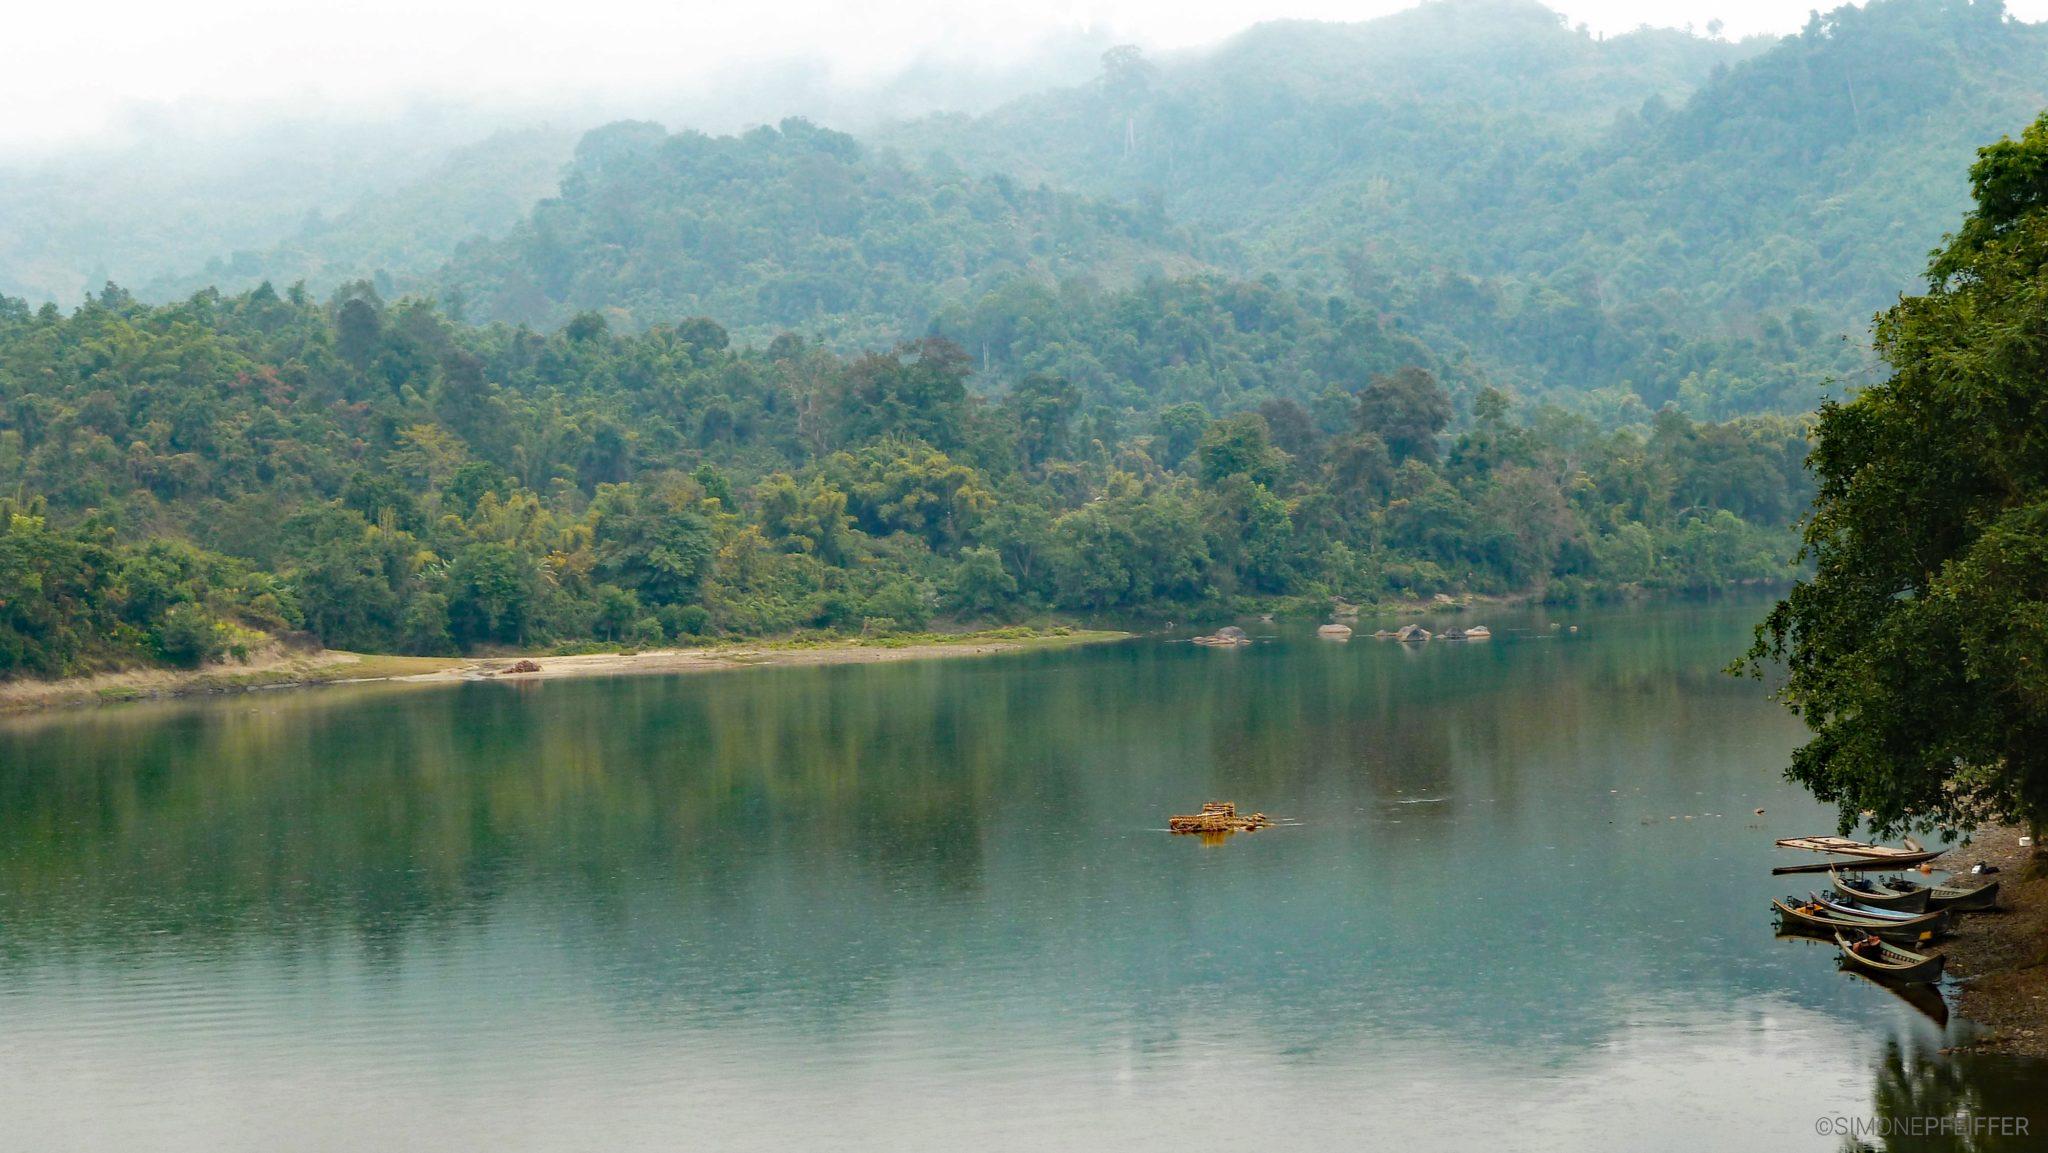 Malikha River - Meulah Lol